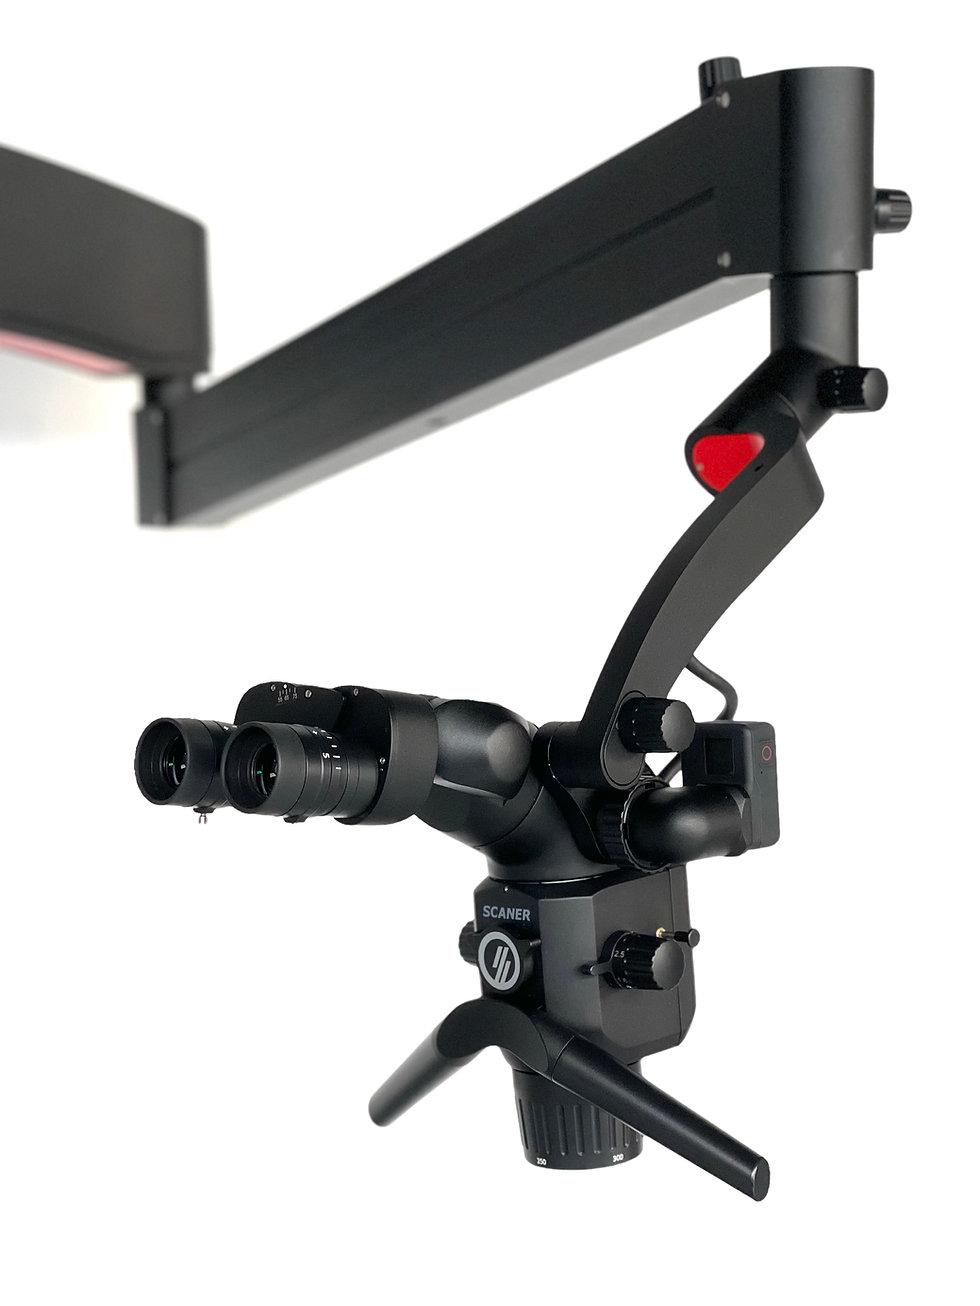 Dentalmikroskop Fluorescence - Microscope4dental.com